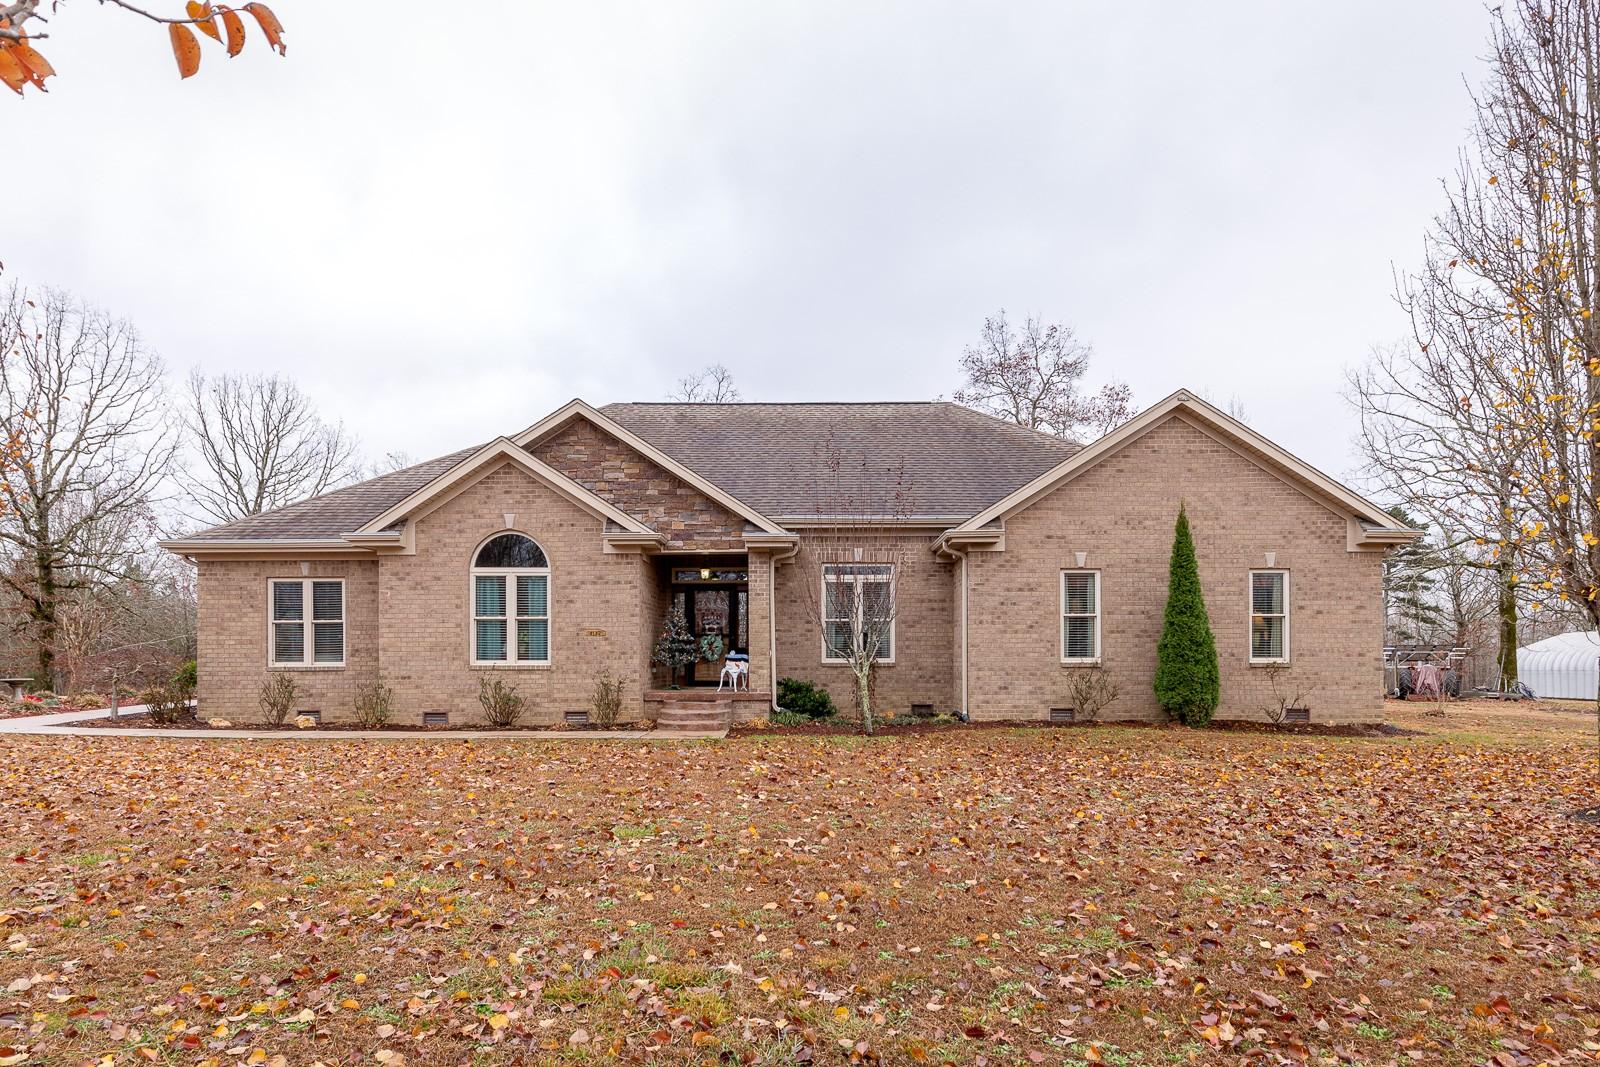 4142 Shady Oak Ln Property Photo - Iron City, TN real estate listing